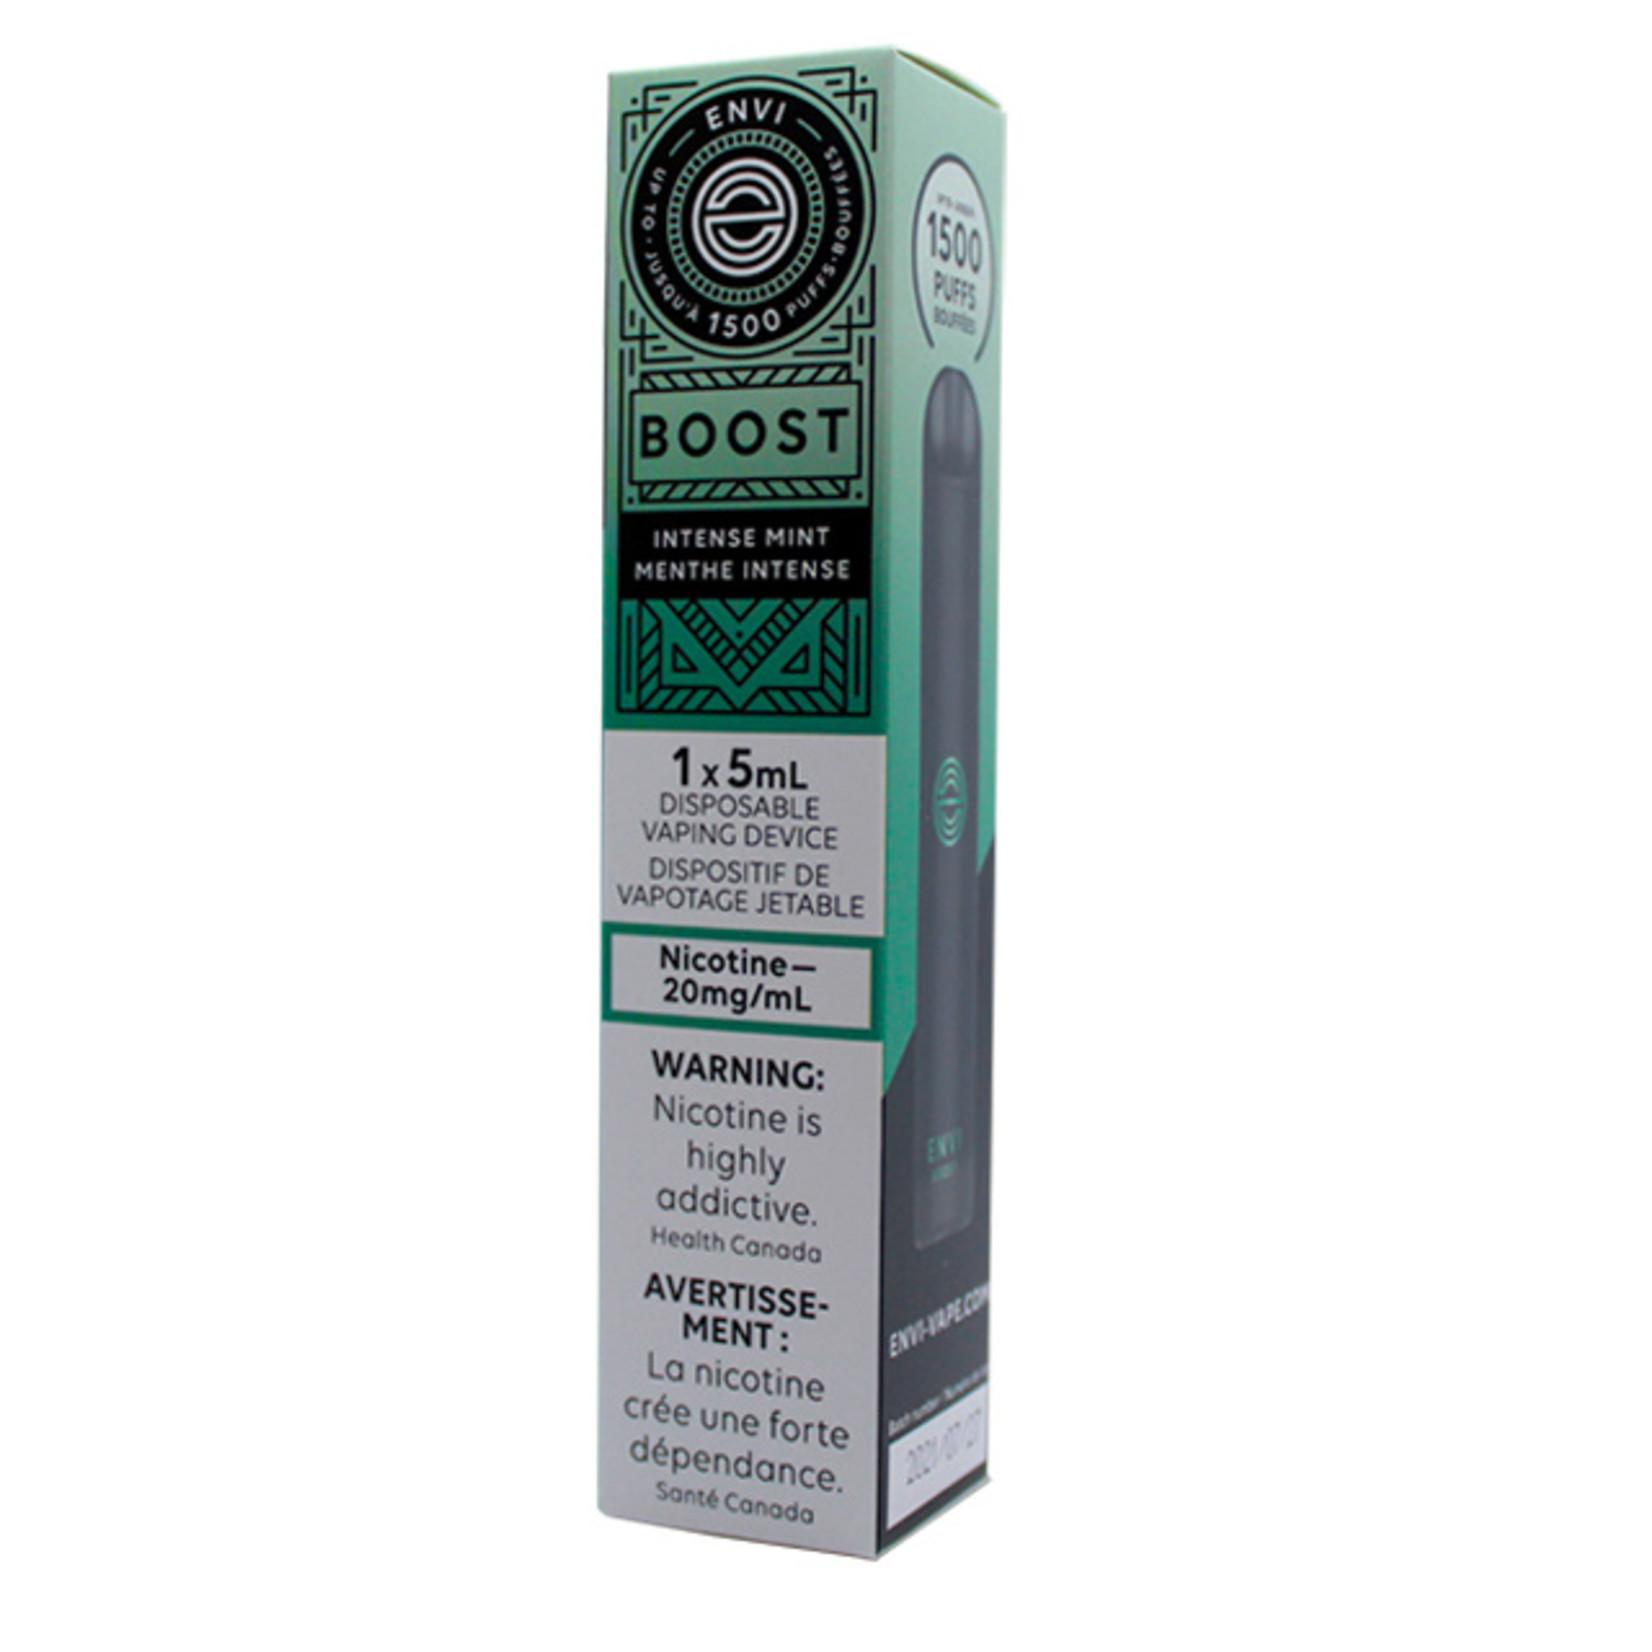 Envi BOOST 1500 Puff Disposable Intense Mint